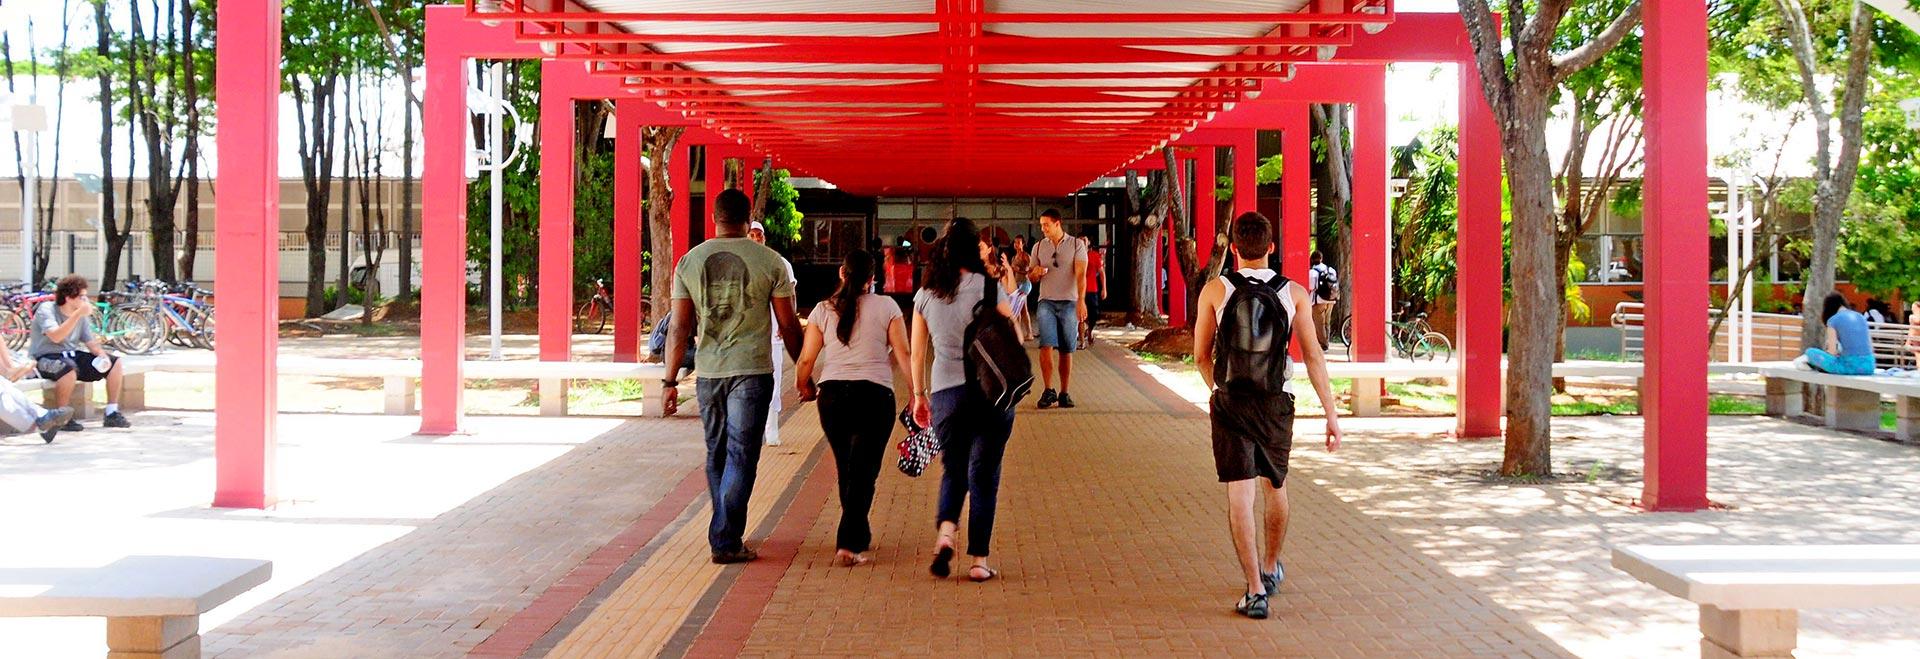 Unicamp terá núcleo de voluntariado para enfrentar coronavírus